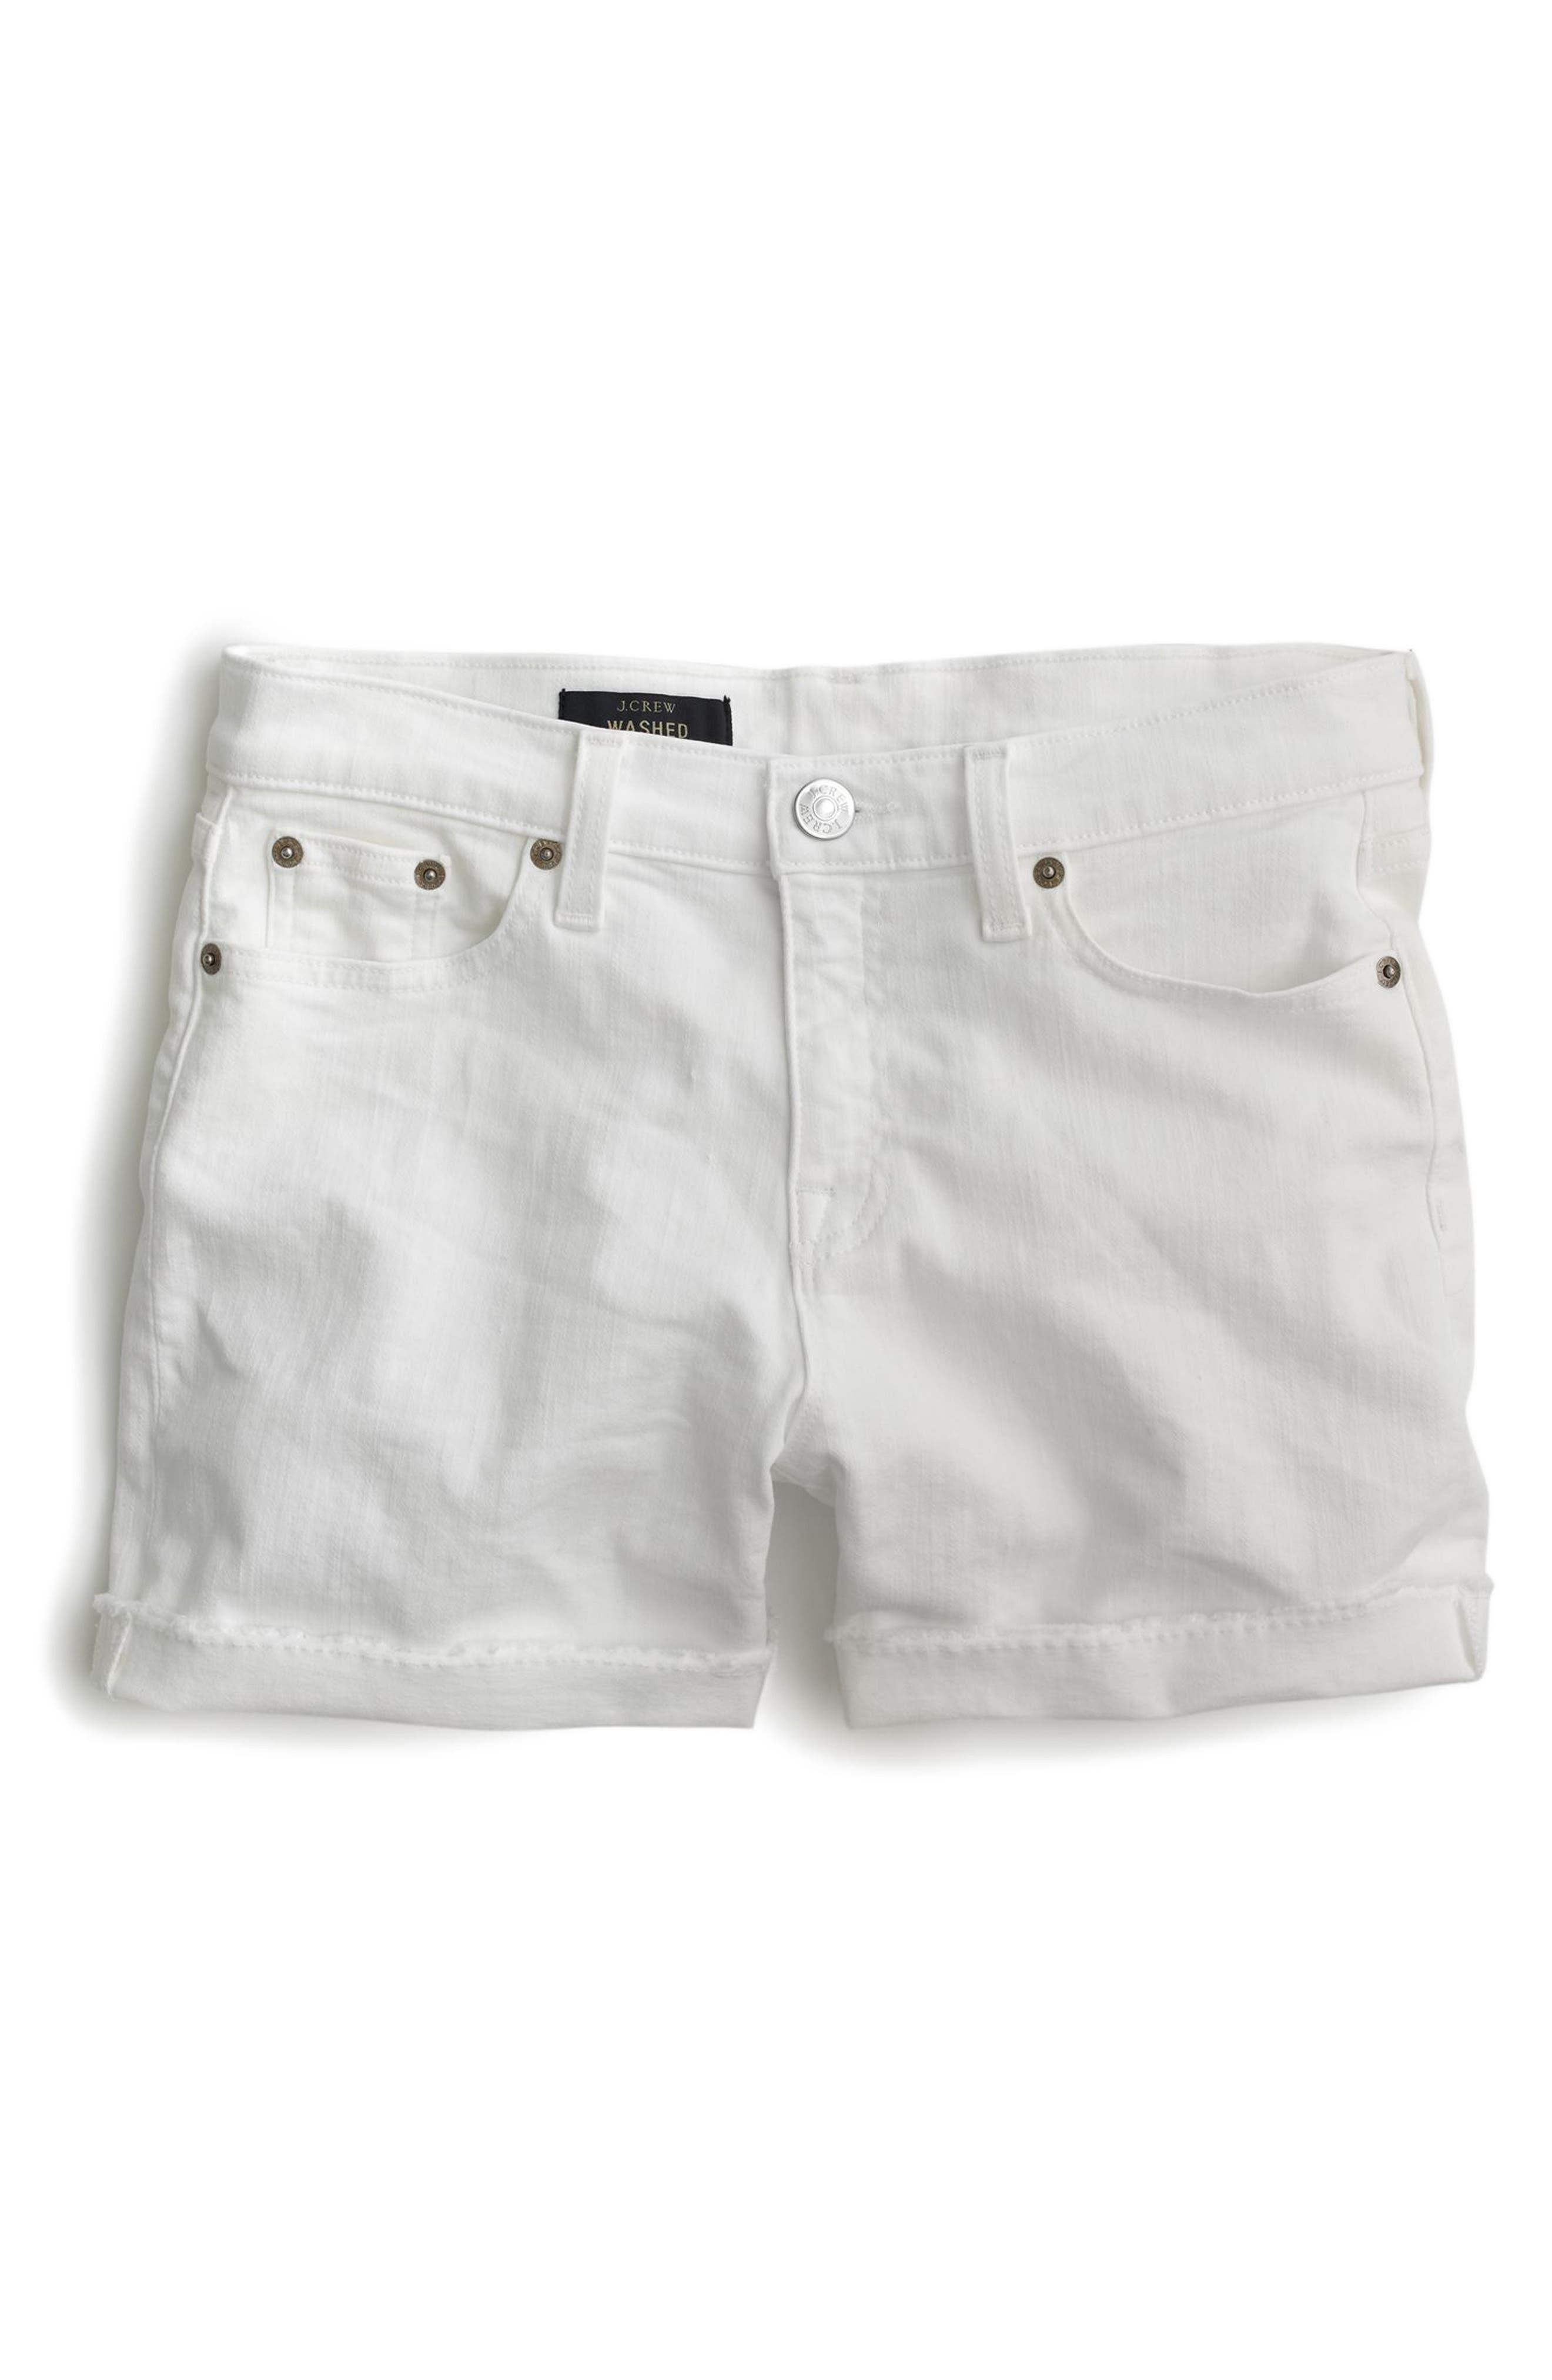 J.CREW, Midrise White Denim Shorts, Alternate thumbnail 2, color, WHITE